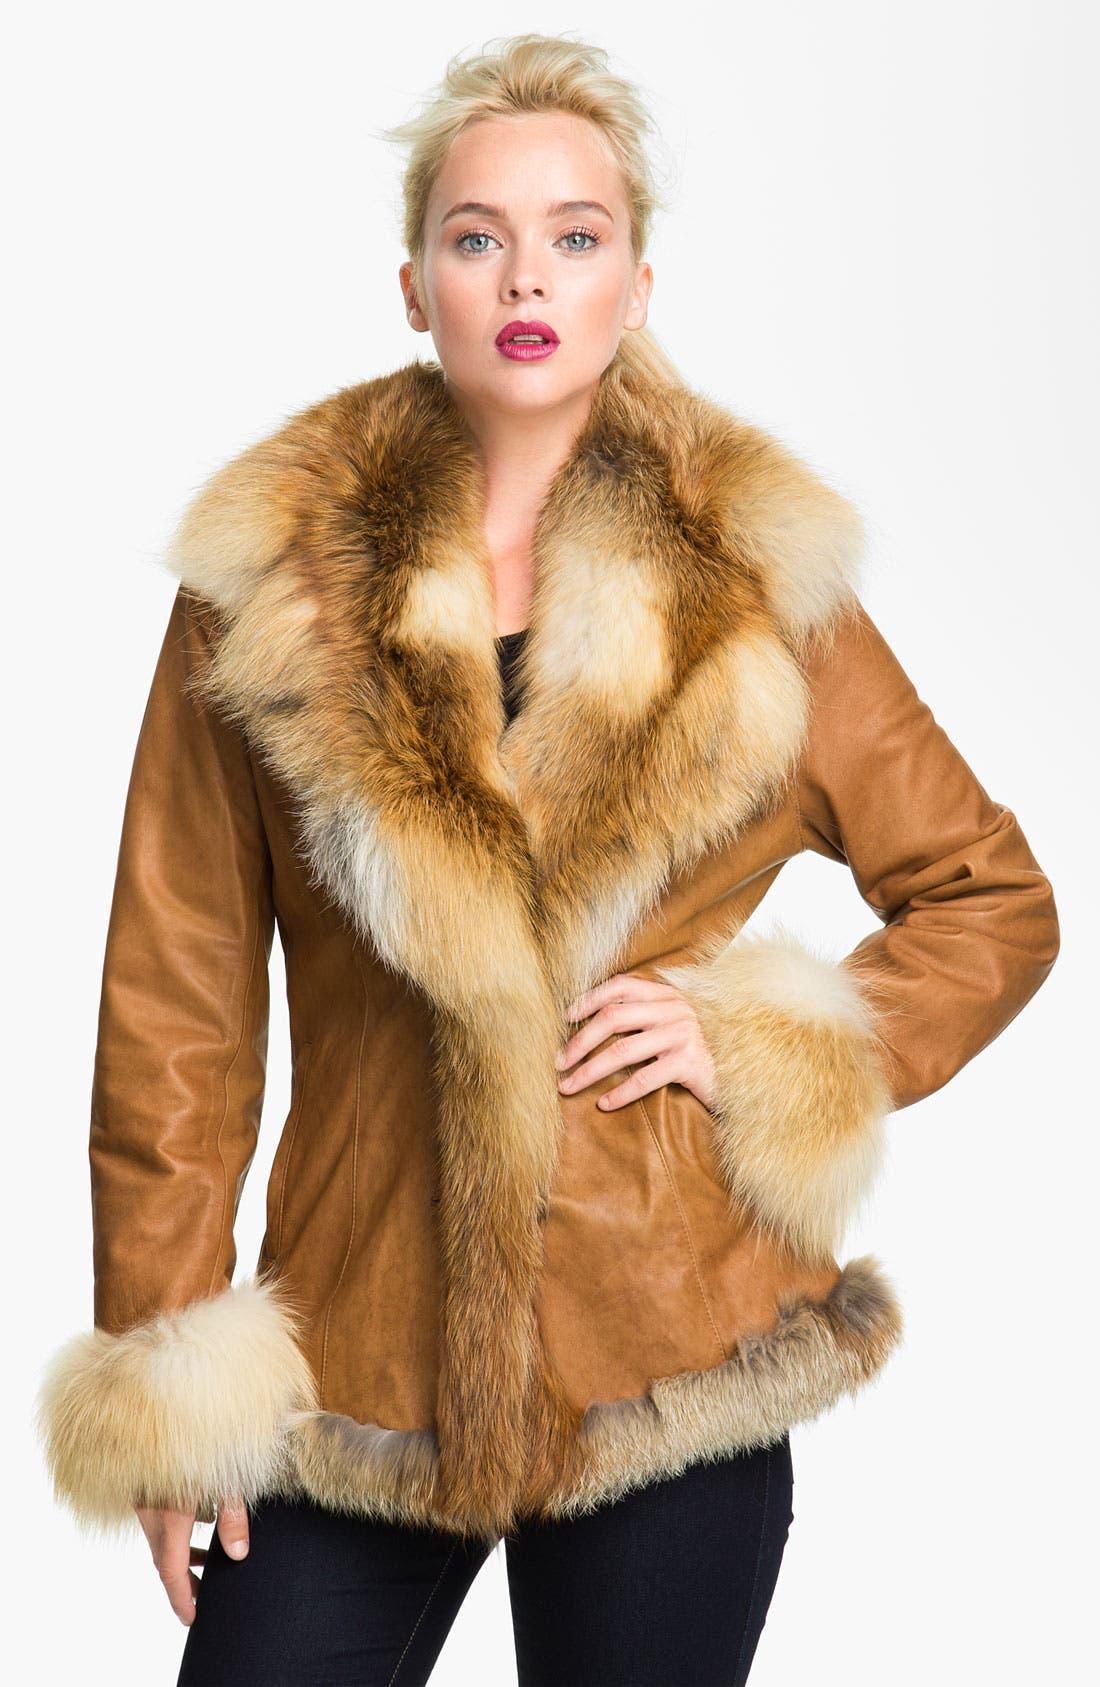 Main Image - Chosen Furs Lambskin Leather Coat with Fox Fur Trim